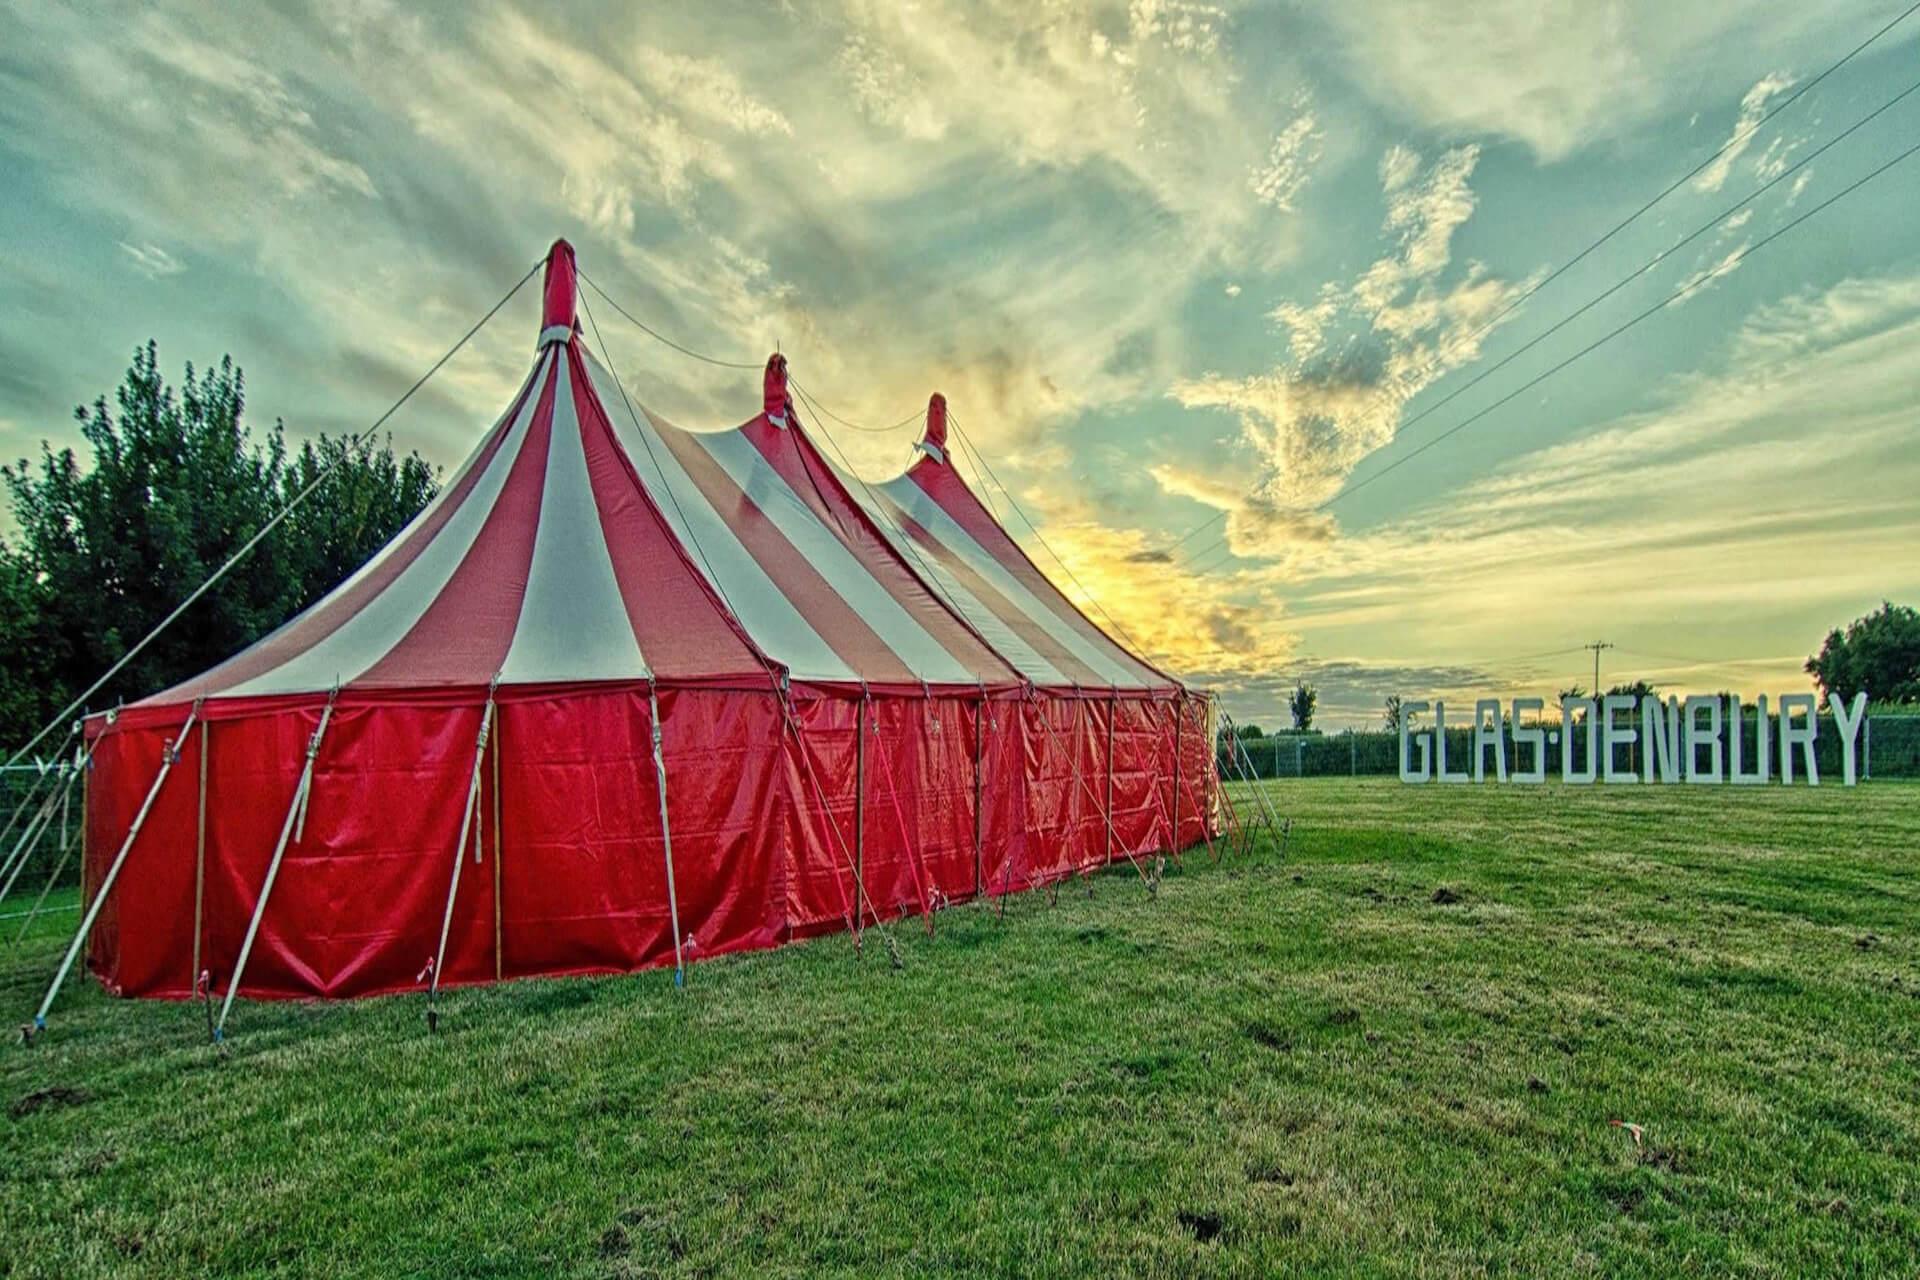 Glasdenbury festival big top venue Devon